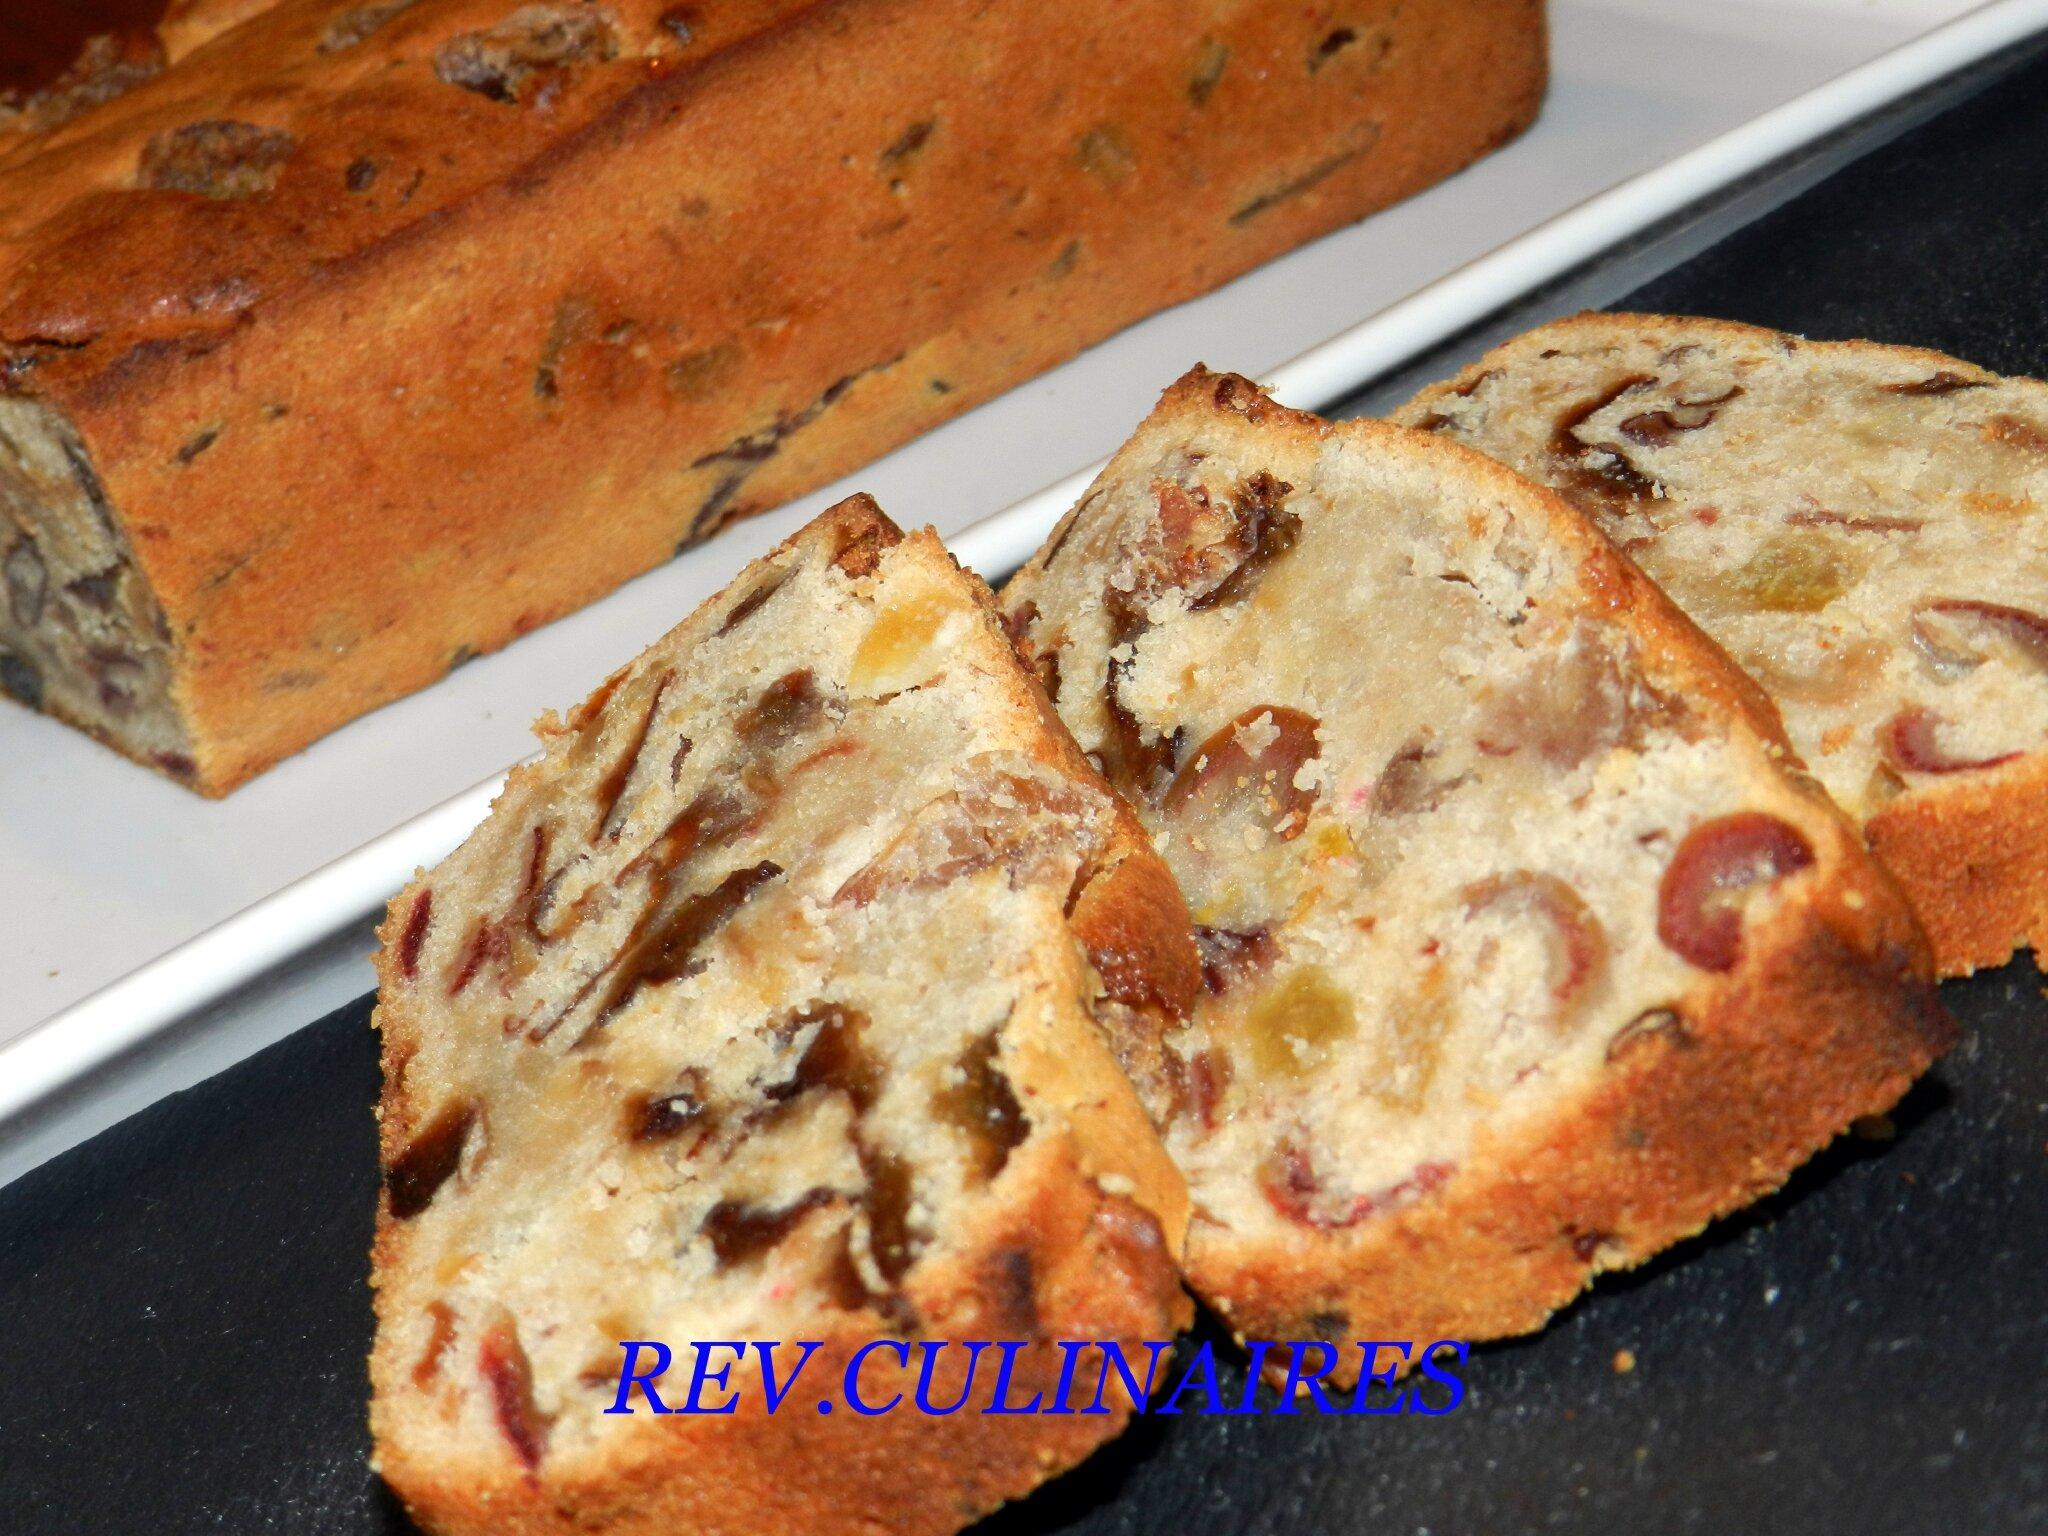 Cake pruneaux,dattes,marrons